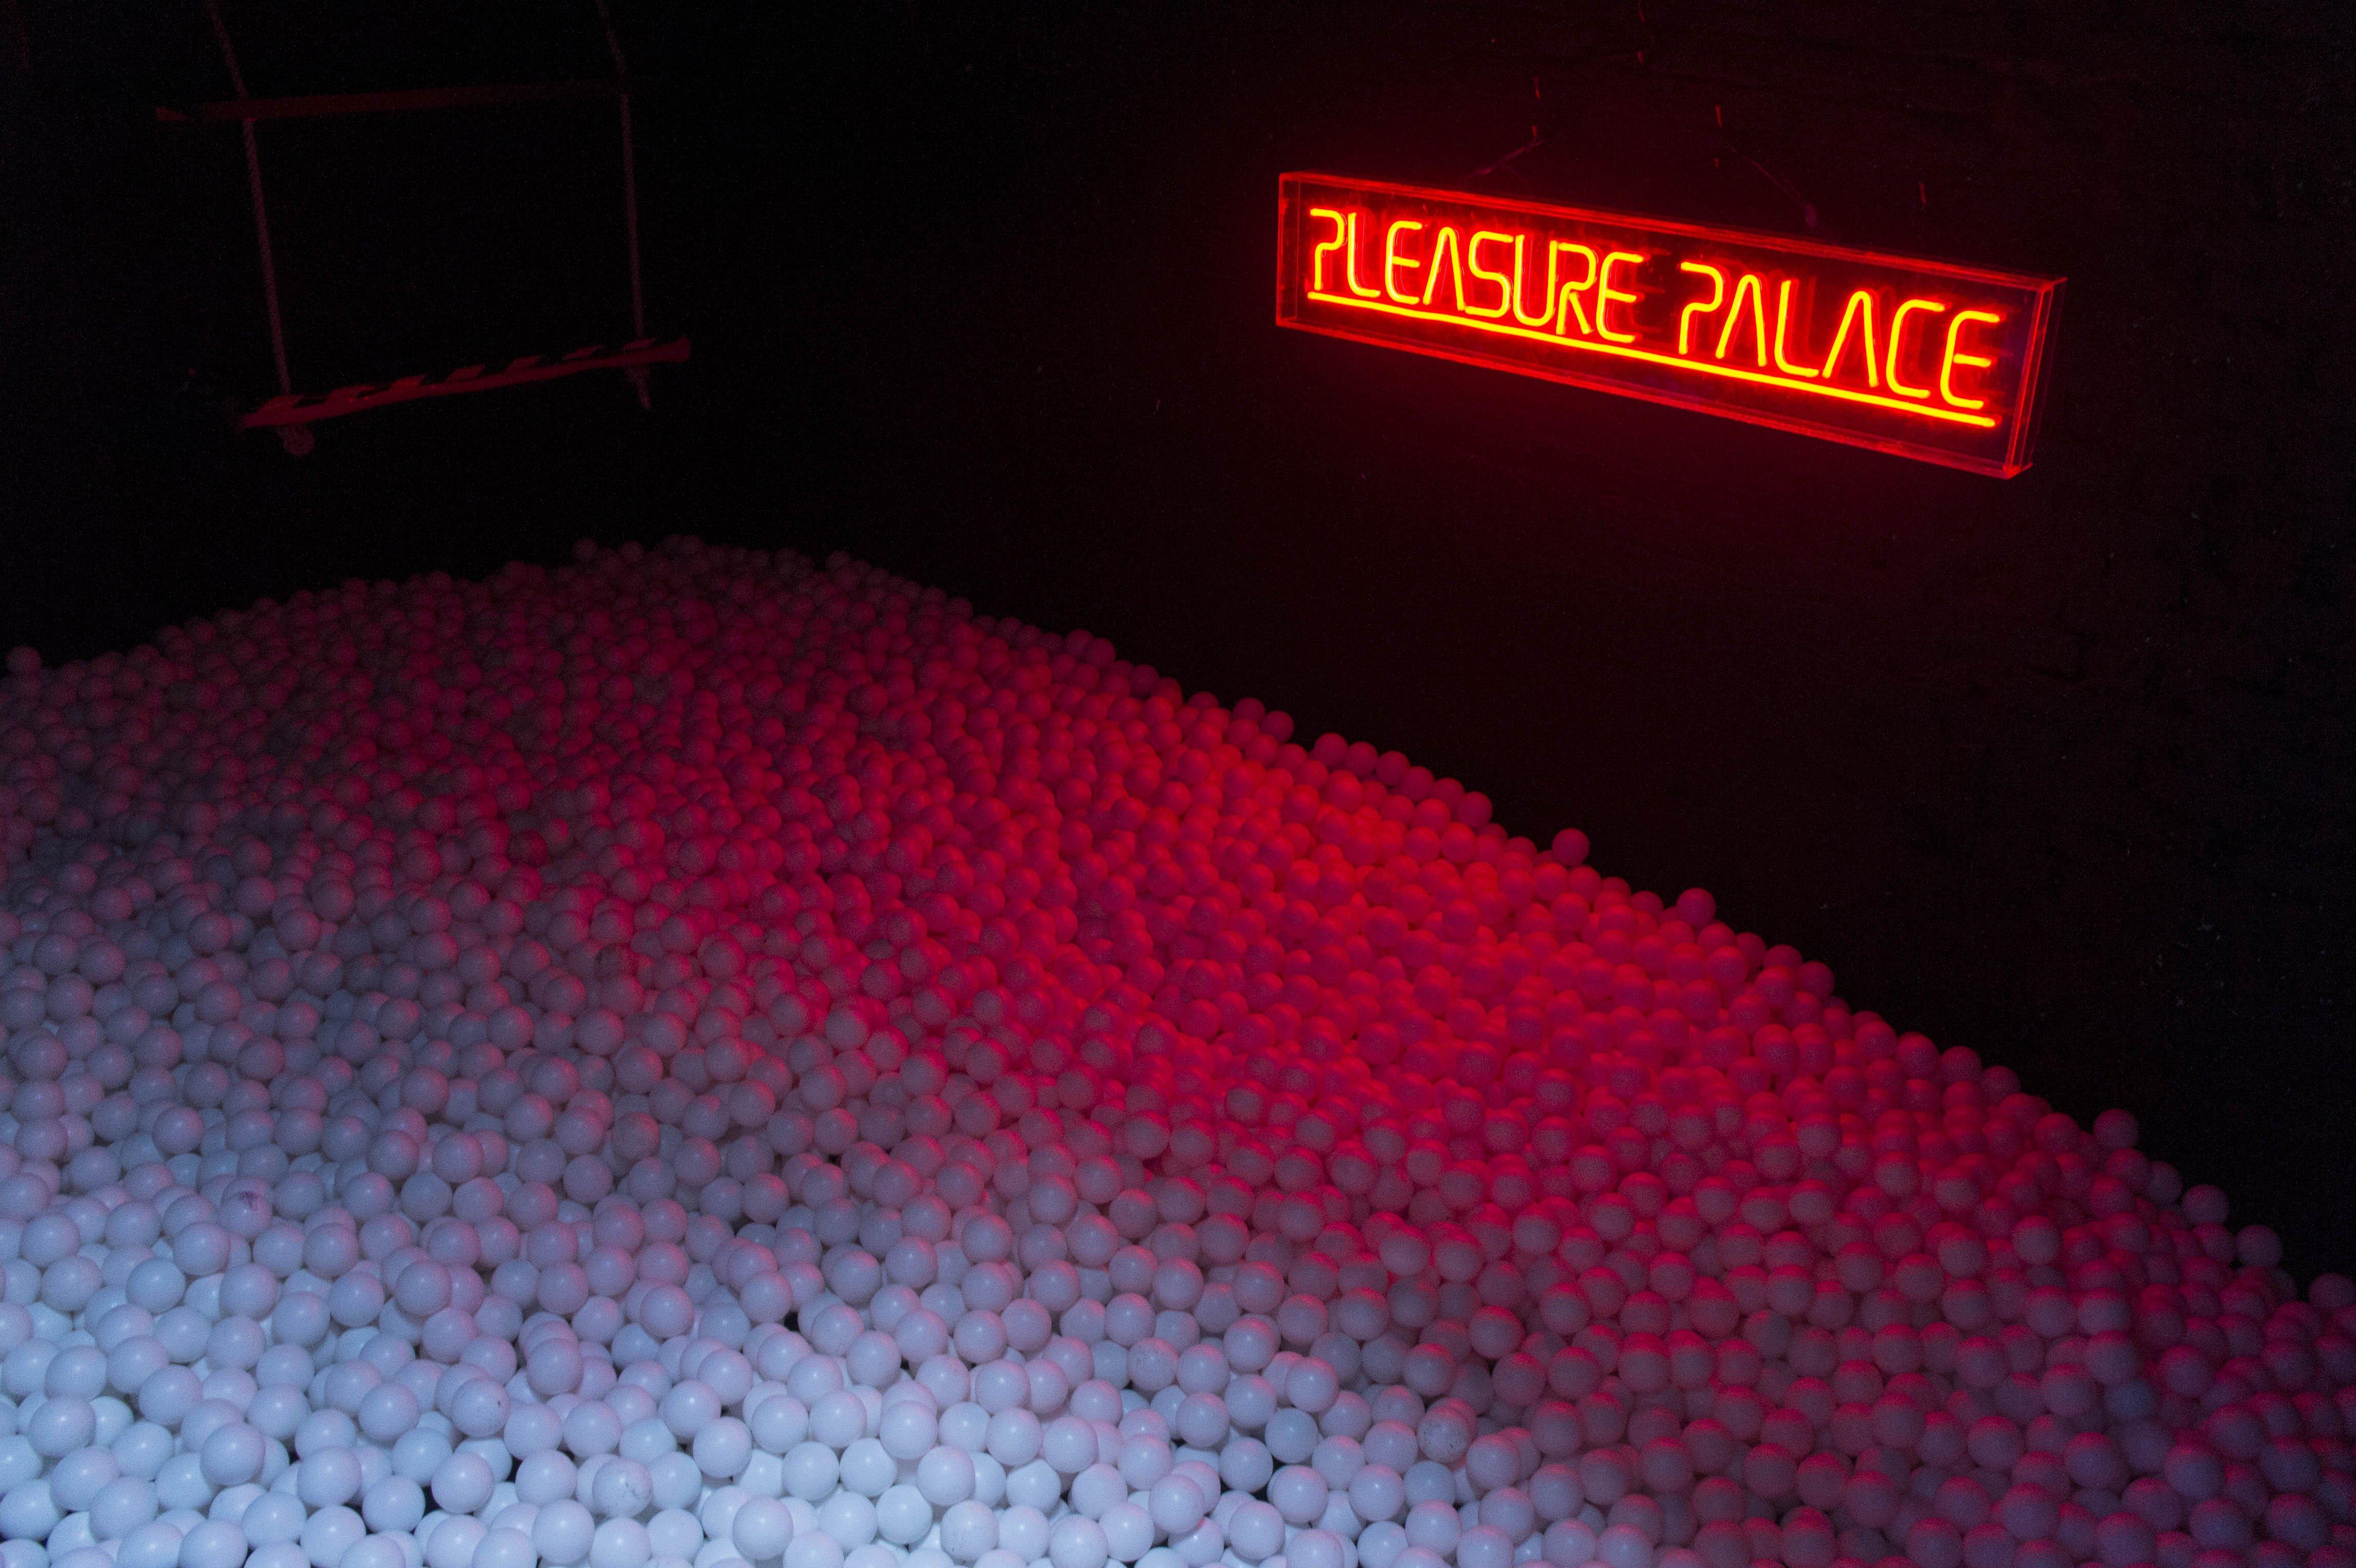 Punchy Ball Pit Pleasure Palace